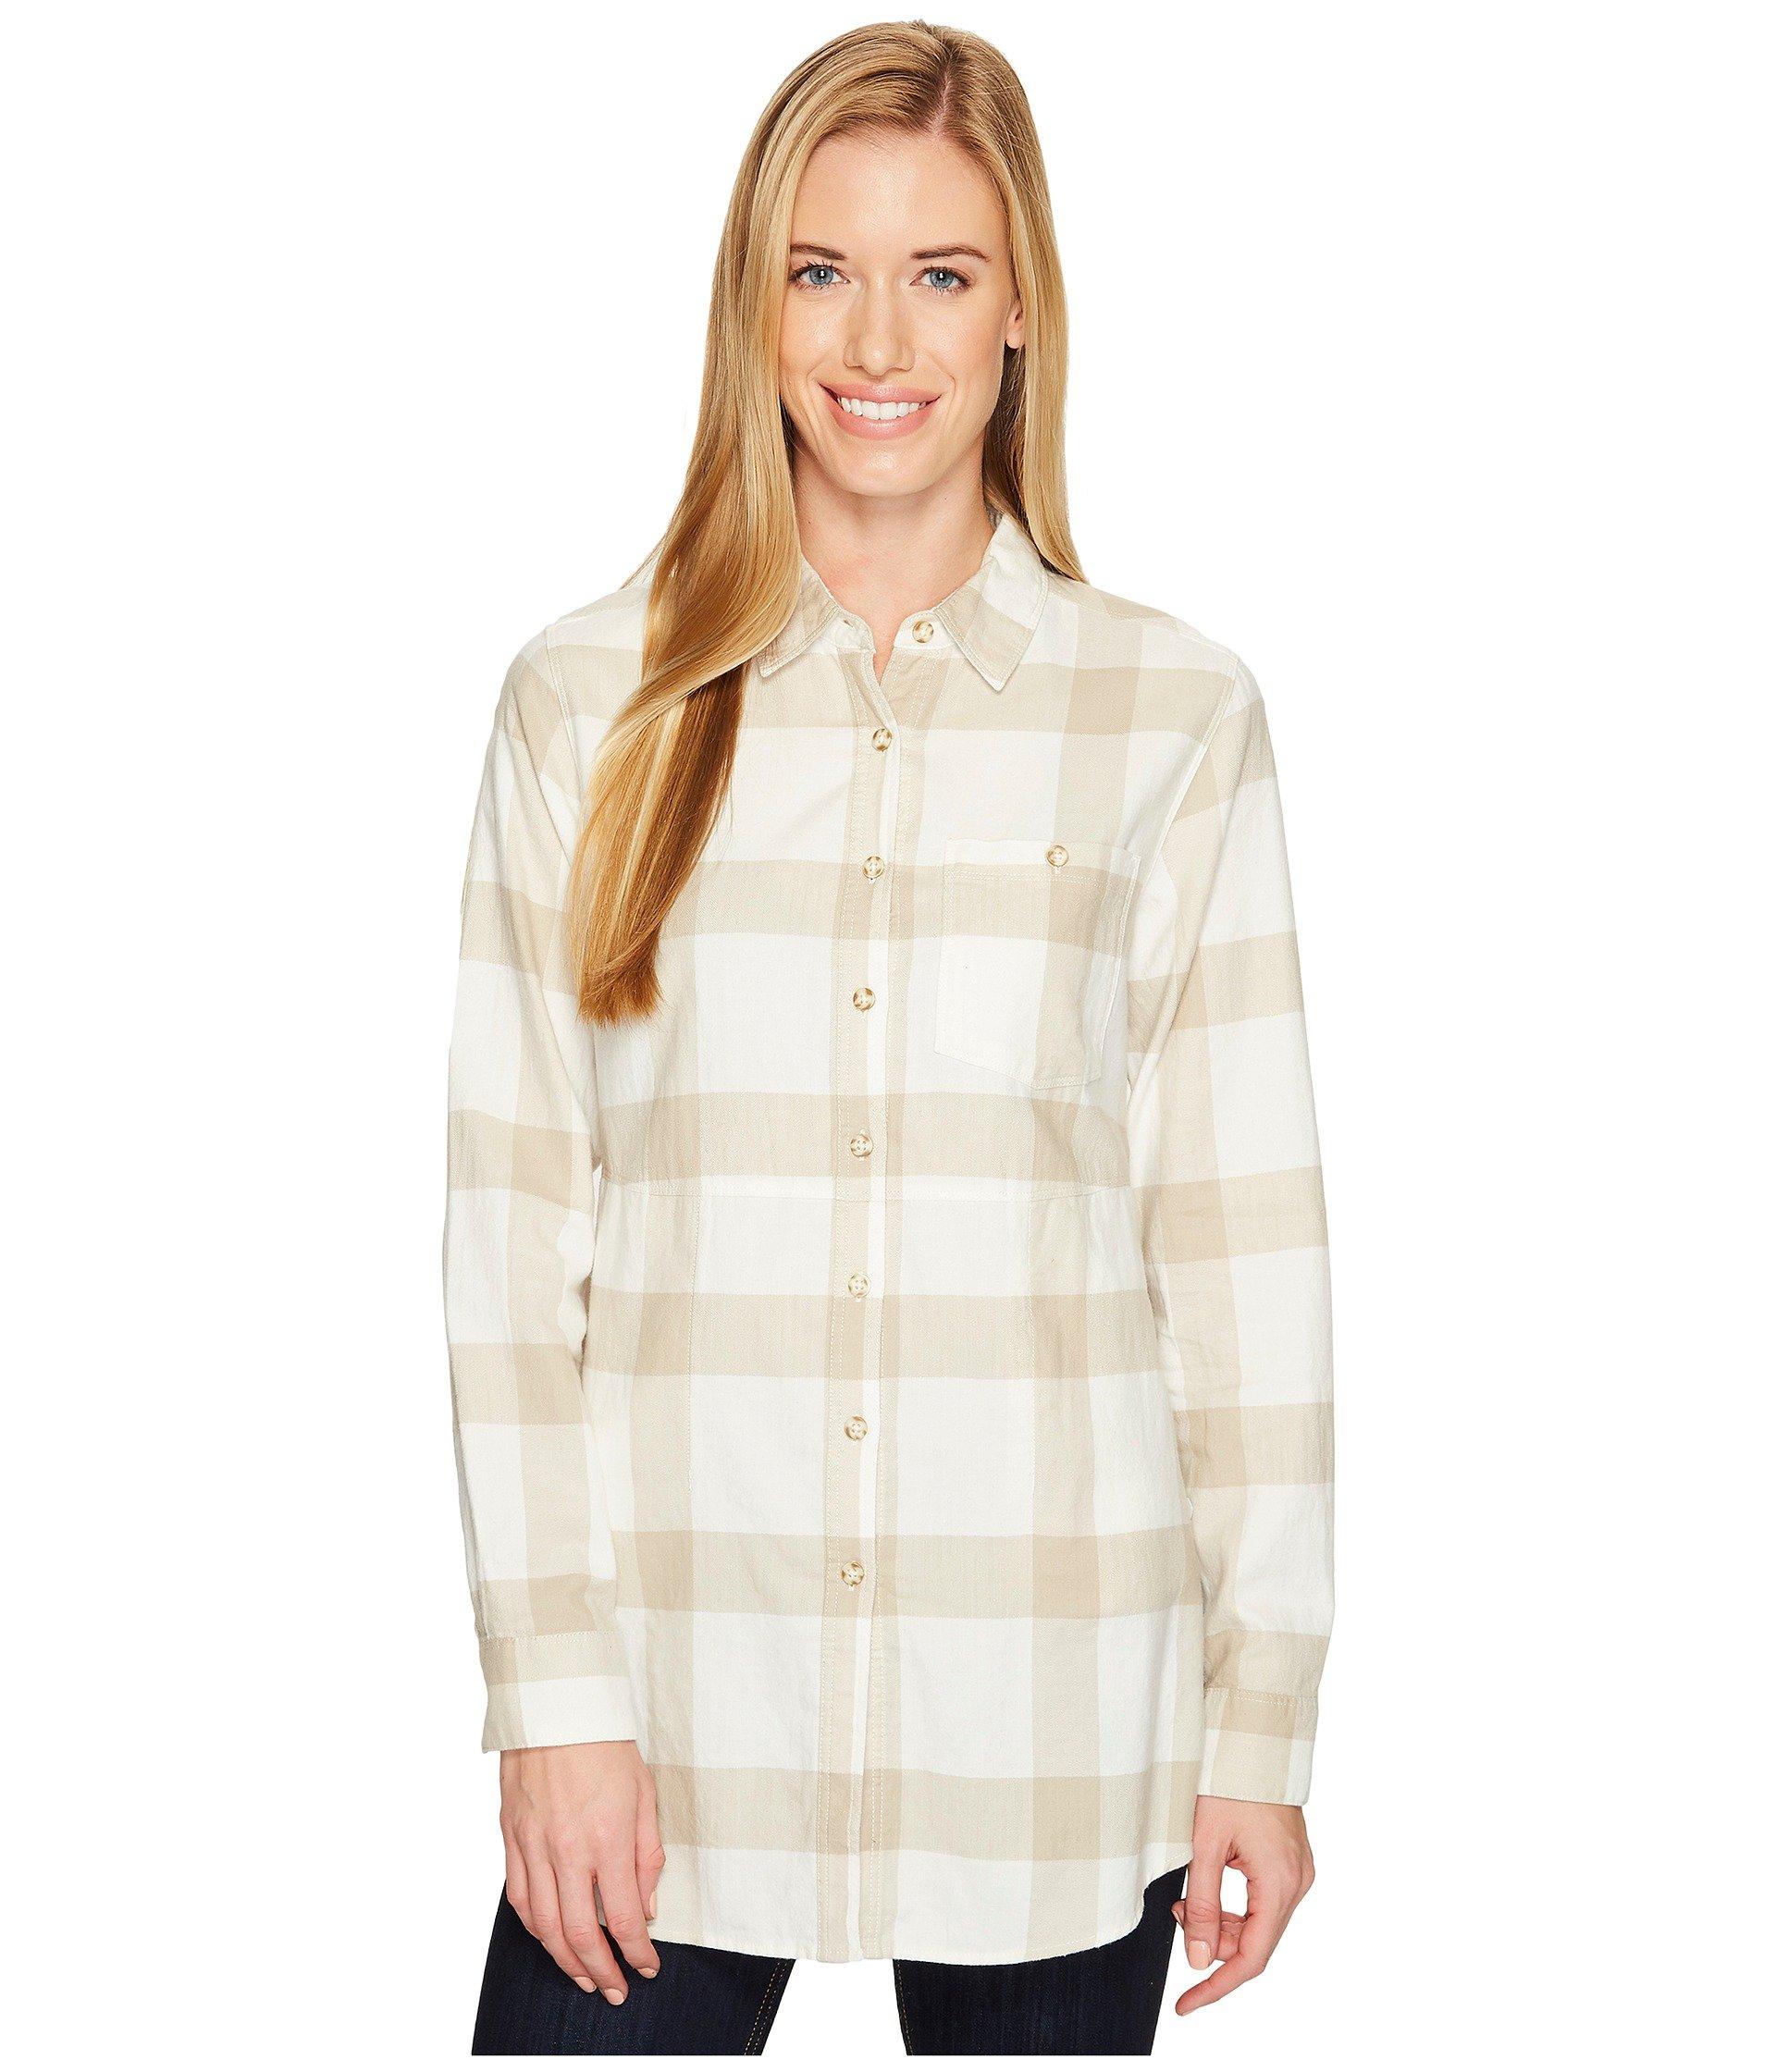 MOUNTAIN HARDWEAR Pt. Isabel Long Sleeve Tunic, Cotton